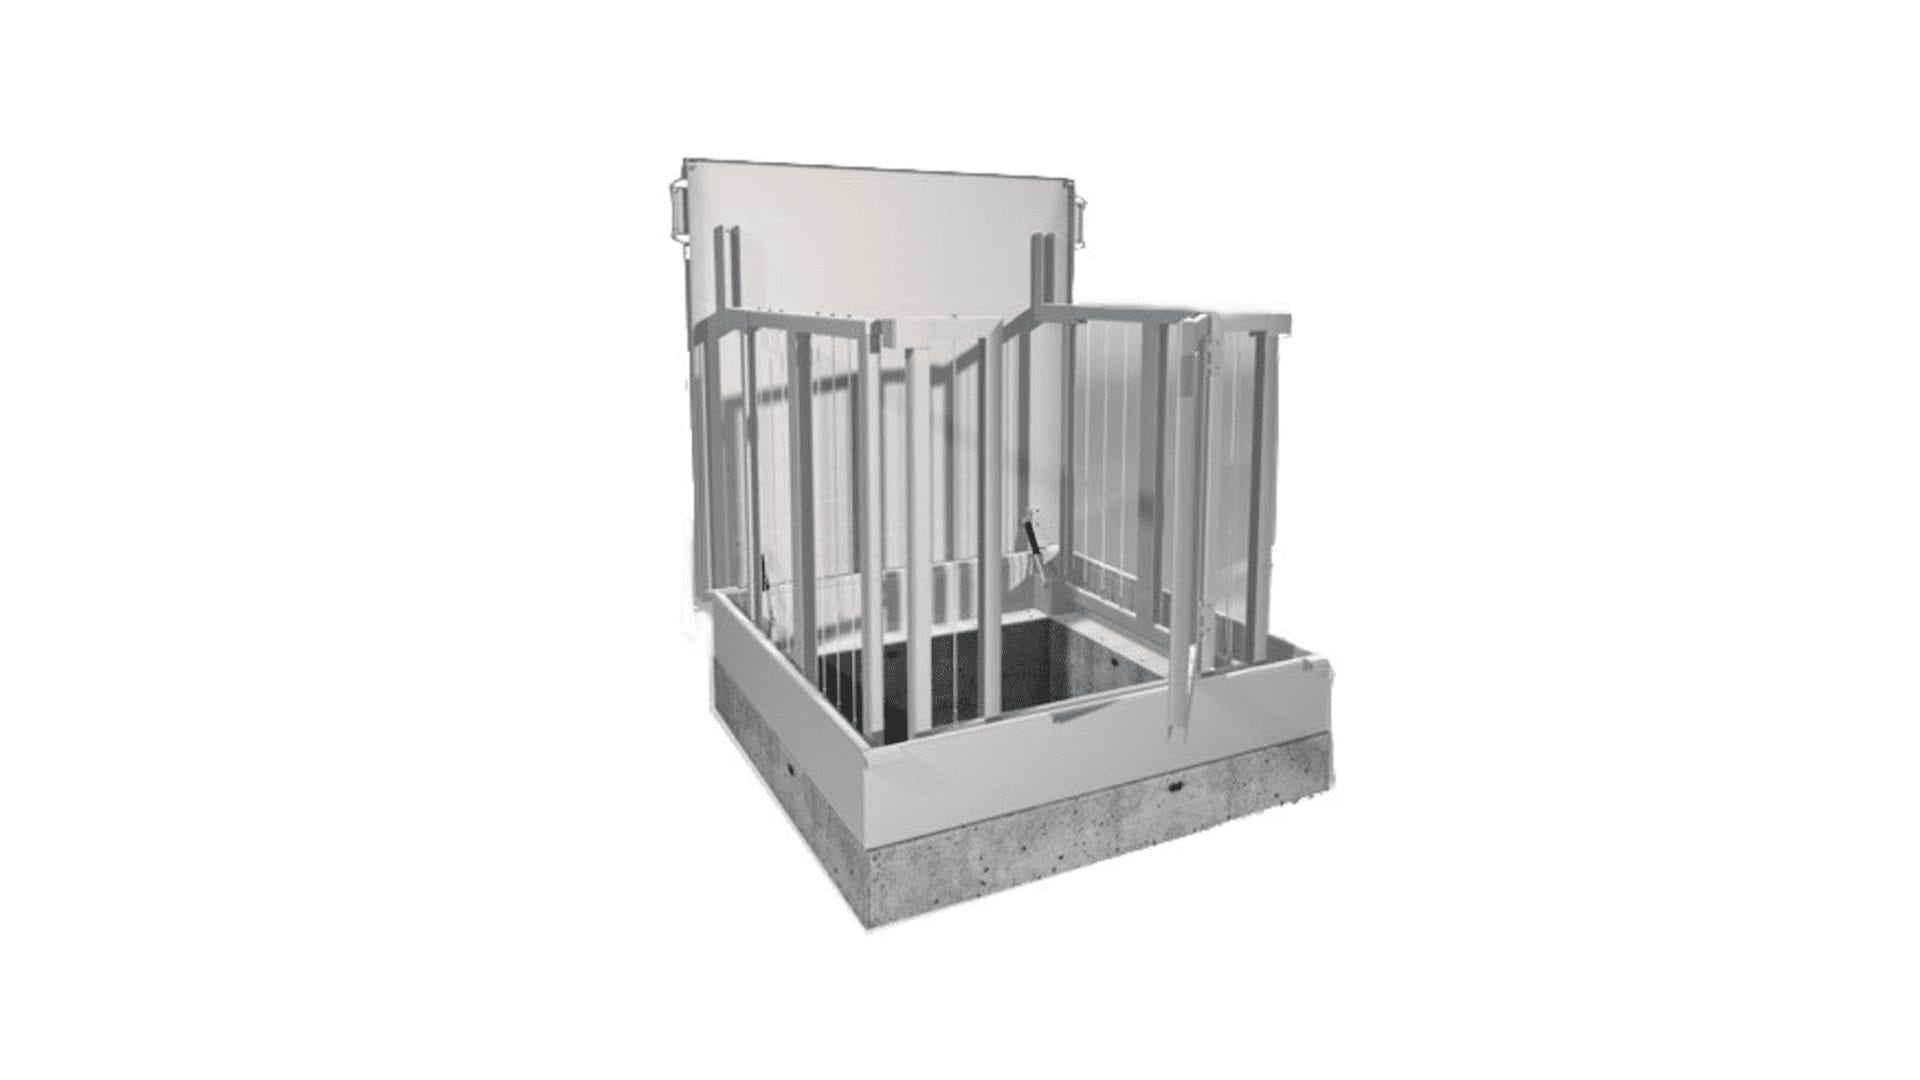 SECURA FLOOR GATE 1